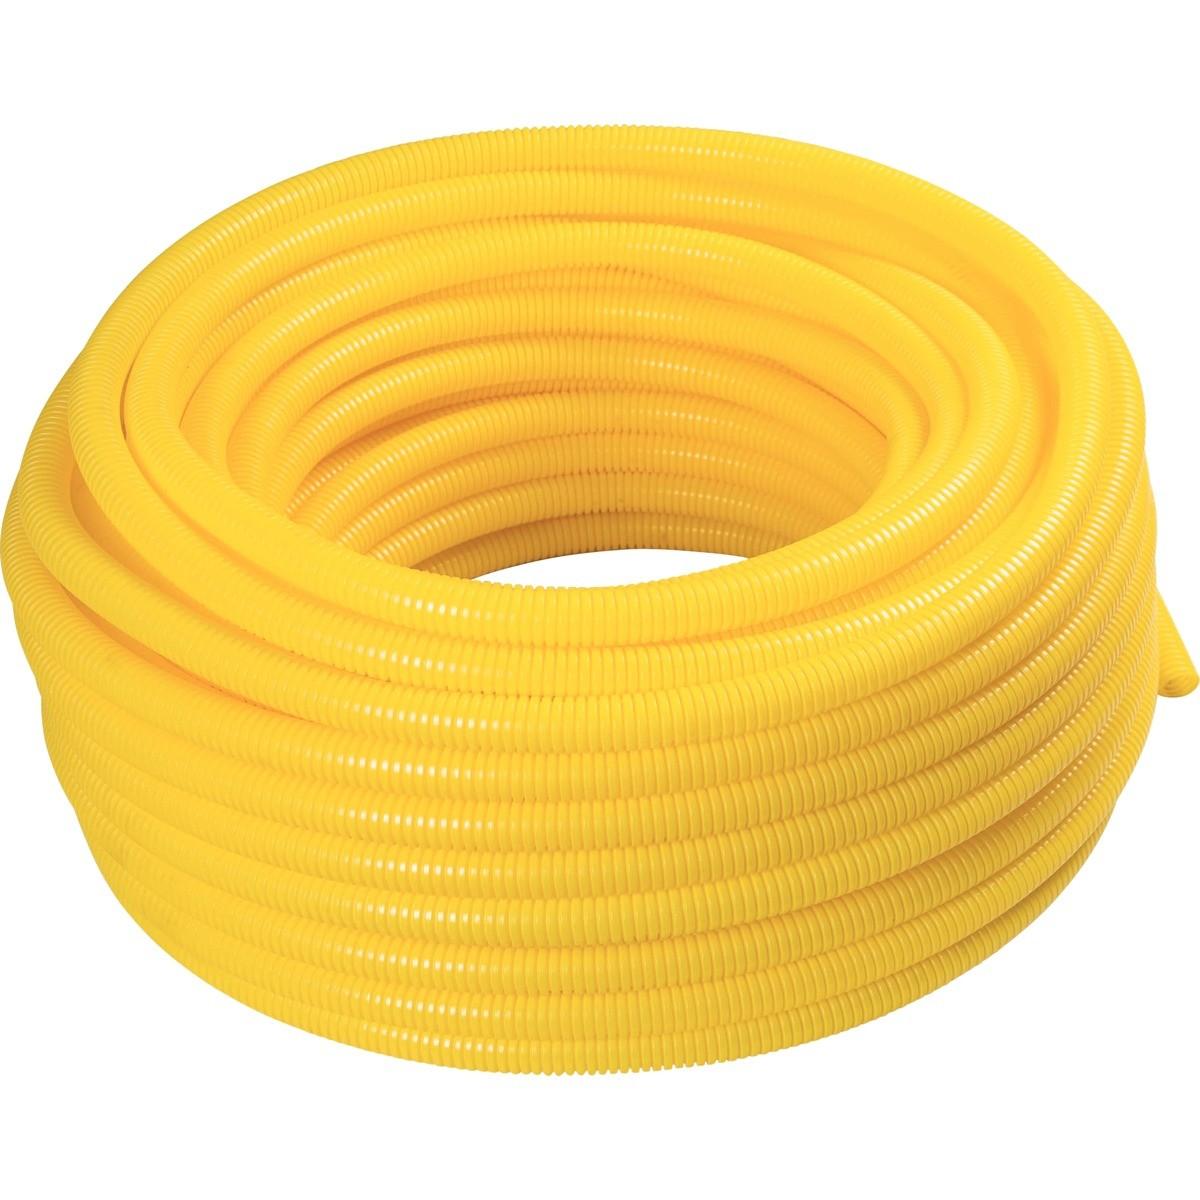 Eletroduto Flexivel Corrugado PVC DN 25 mm 34 x 50m Amarelo - Tramontina